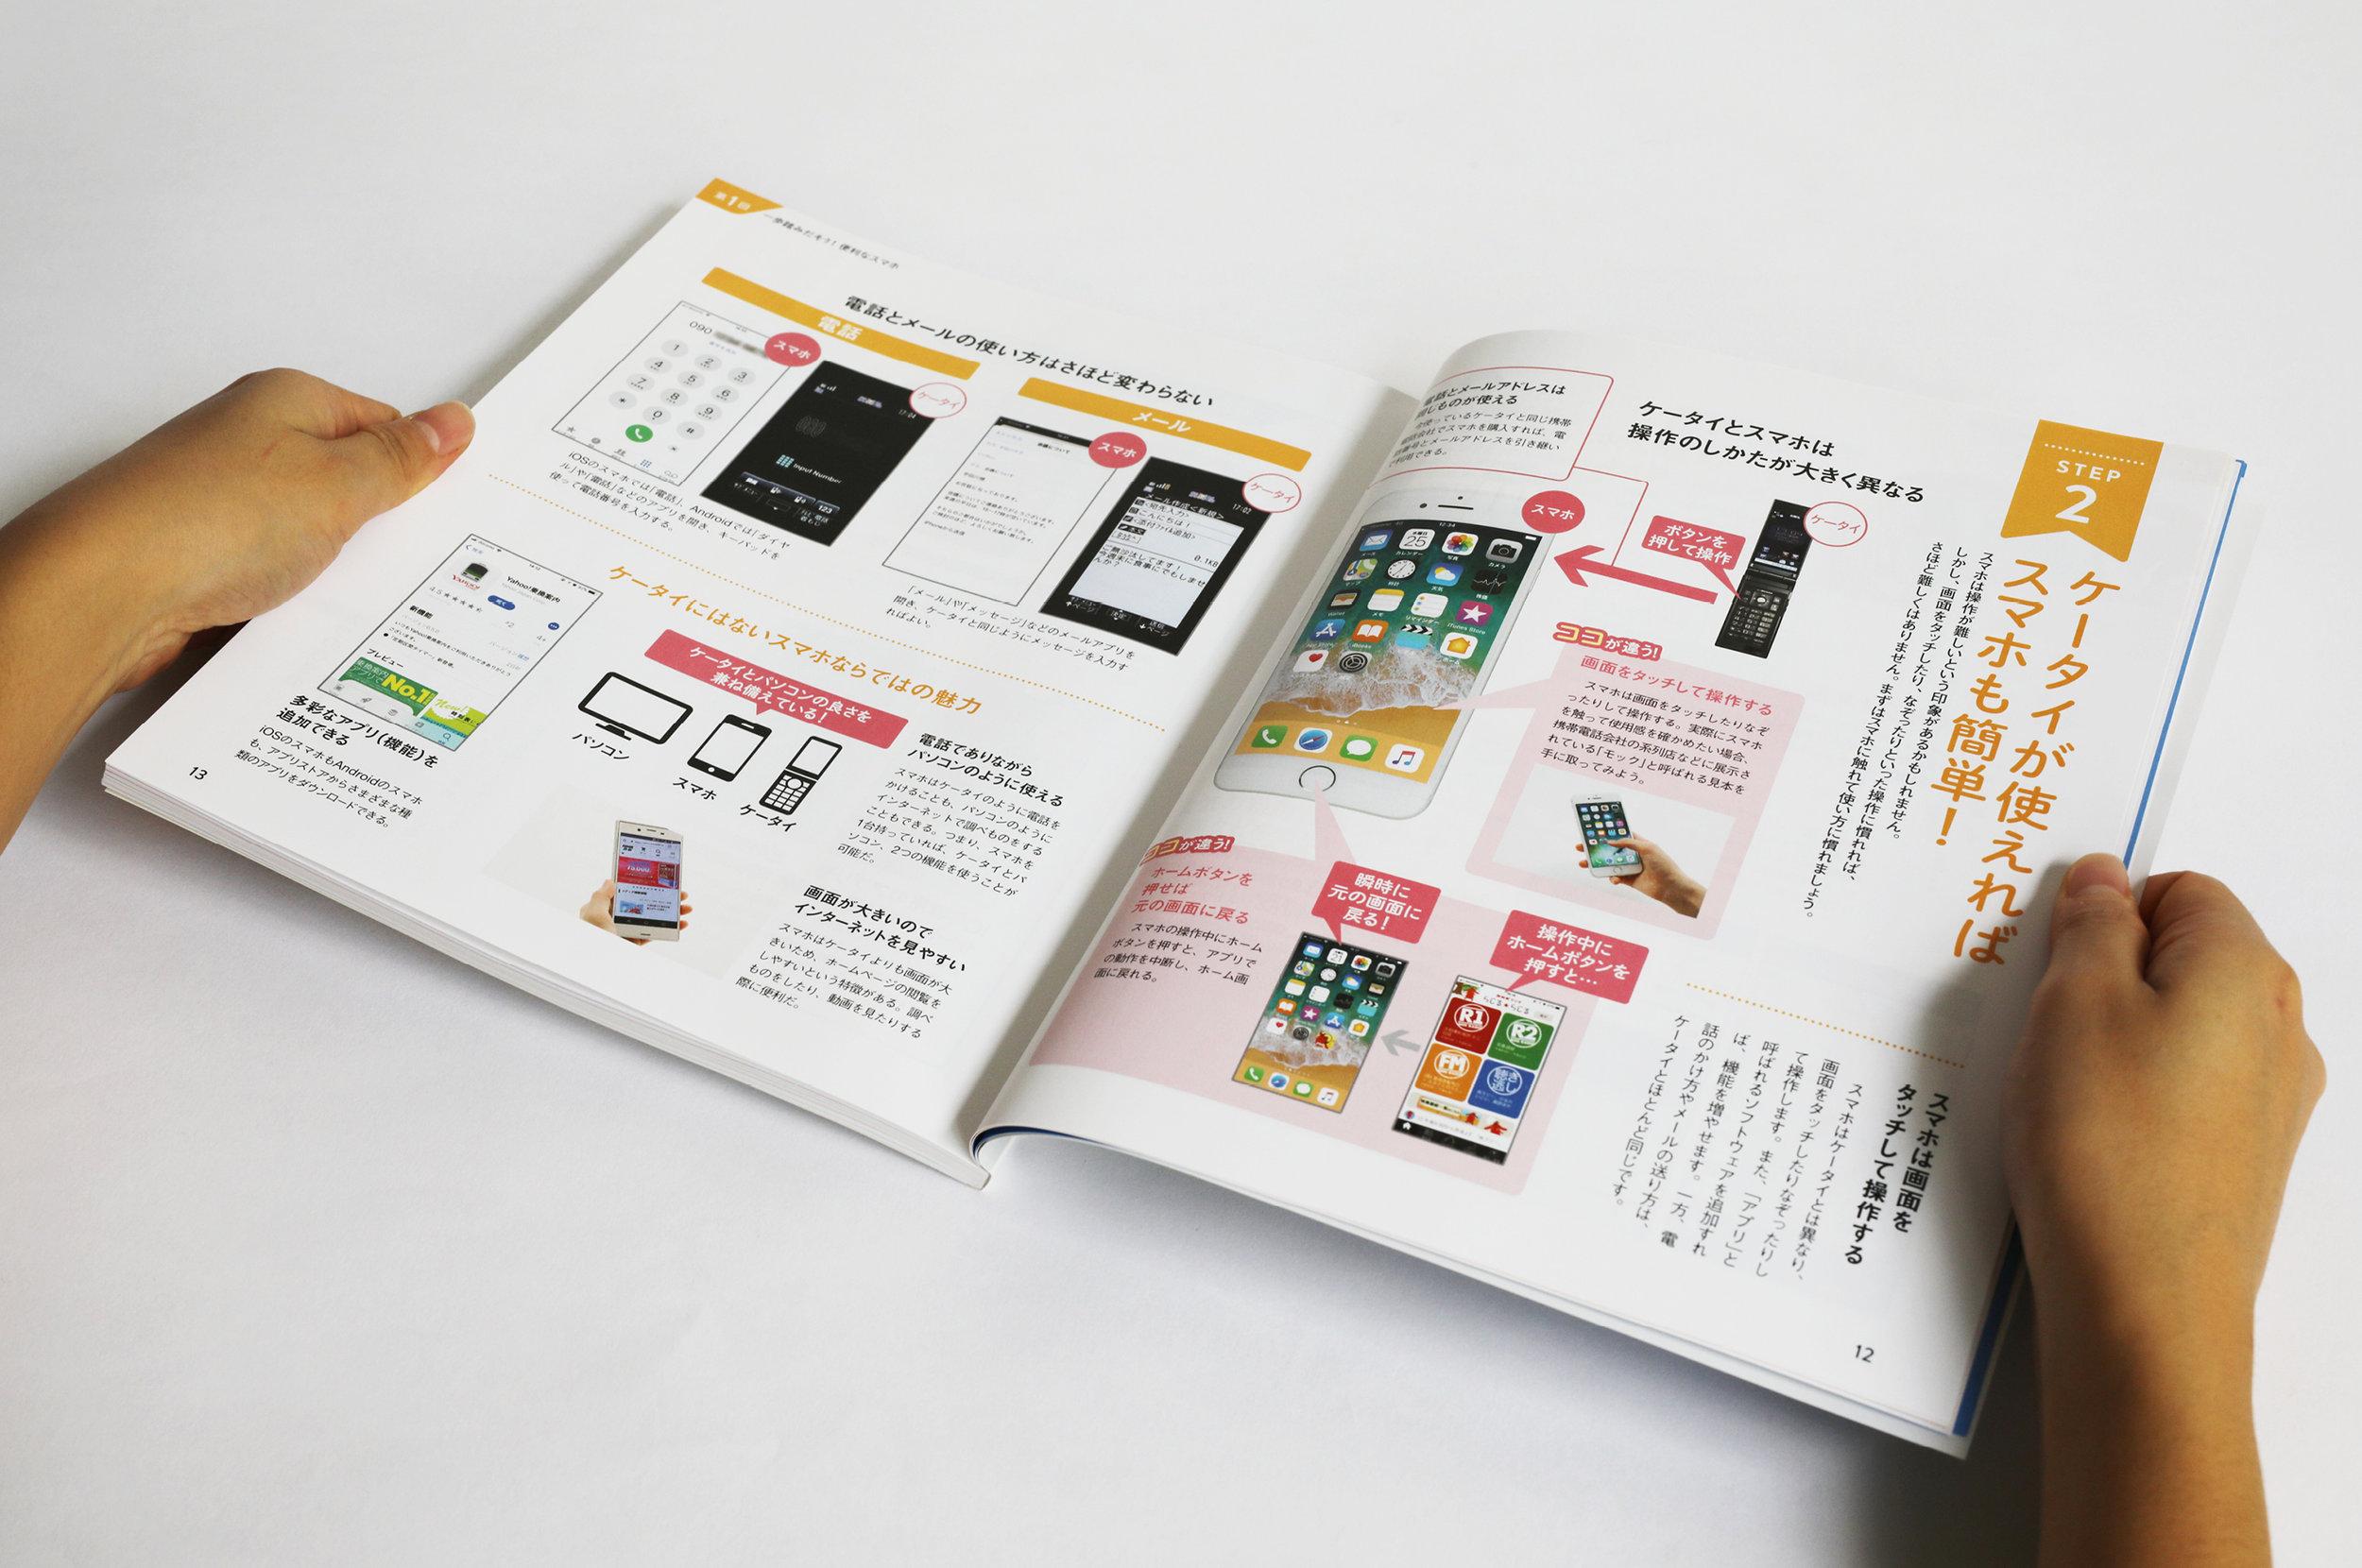 NHK_shumi_8.jpg